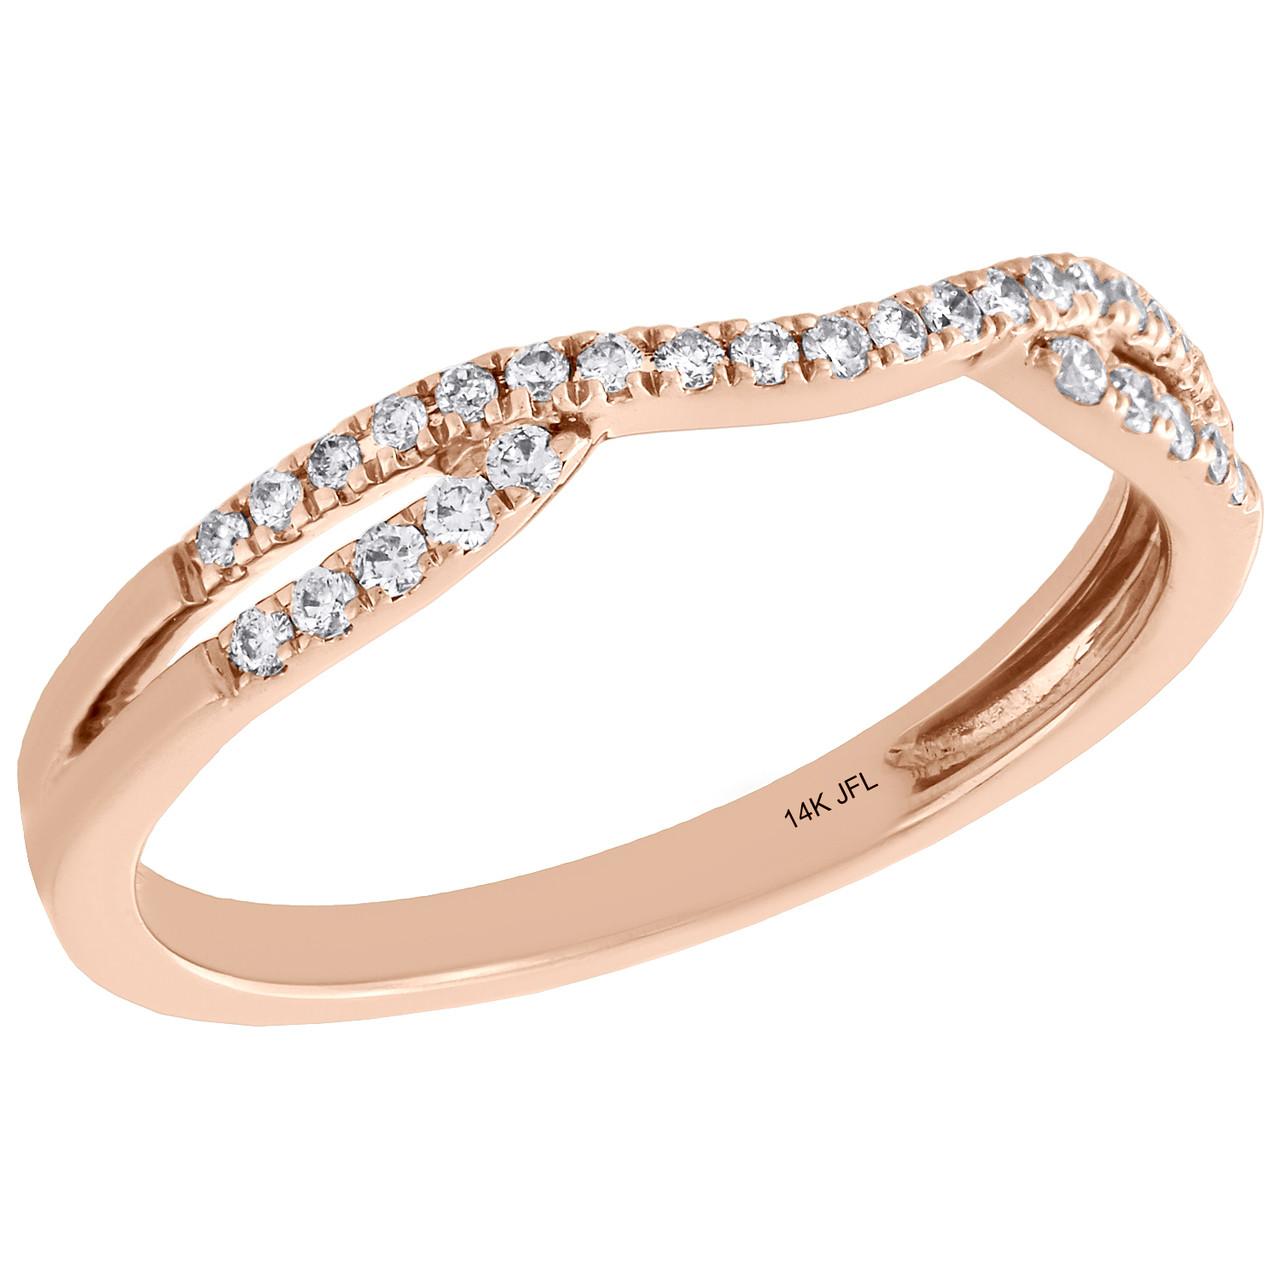 Wedding Bands For Less: 14K Rose Gold Round Diamond Contour Enhancer Ring Ladies